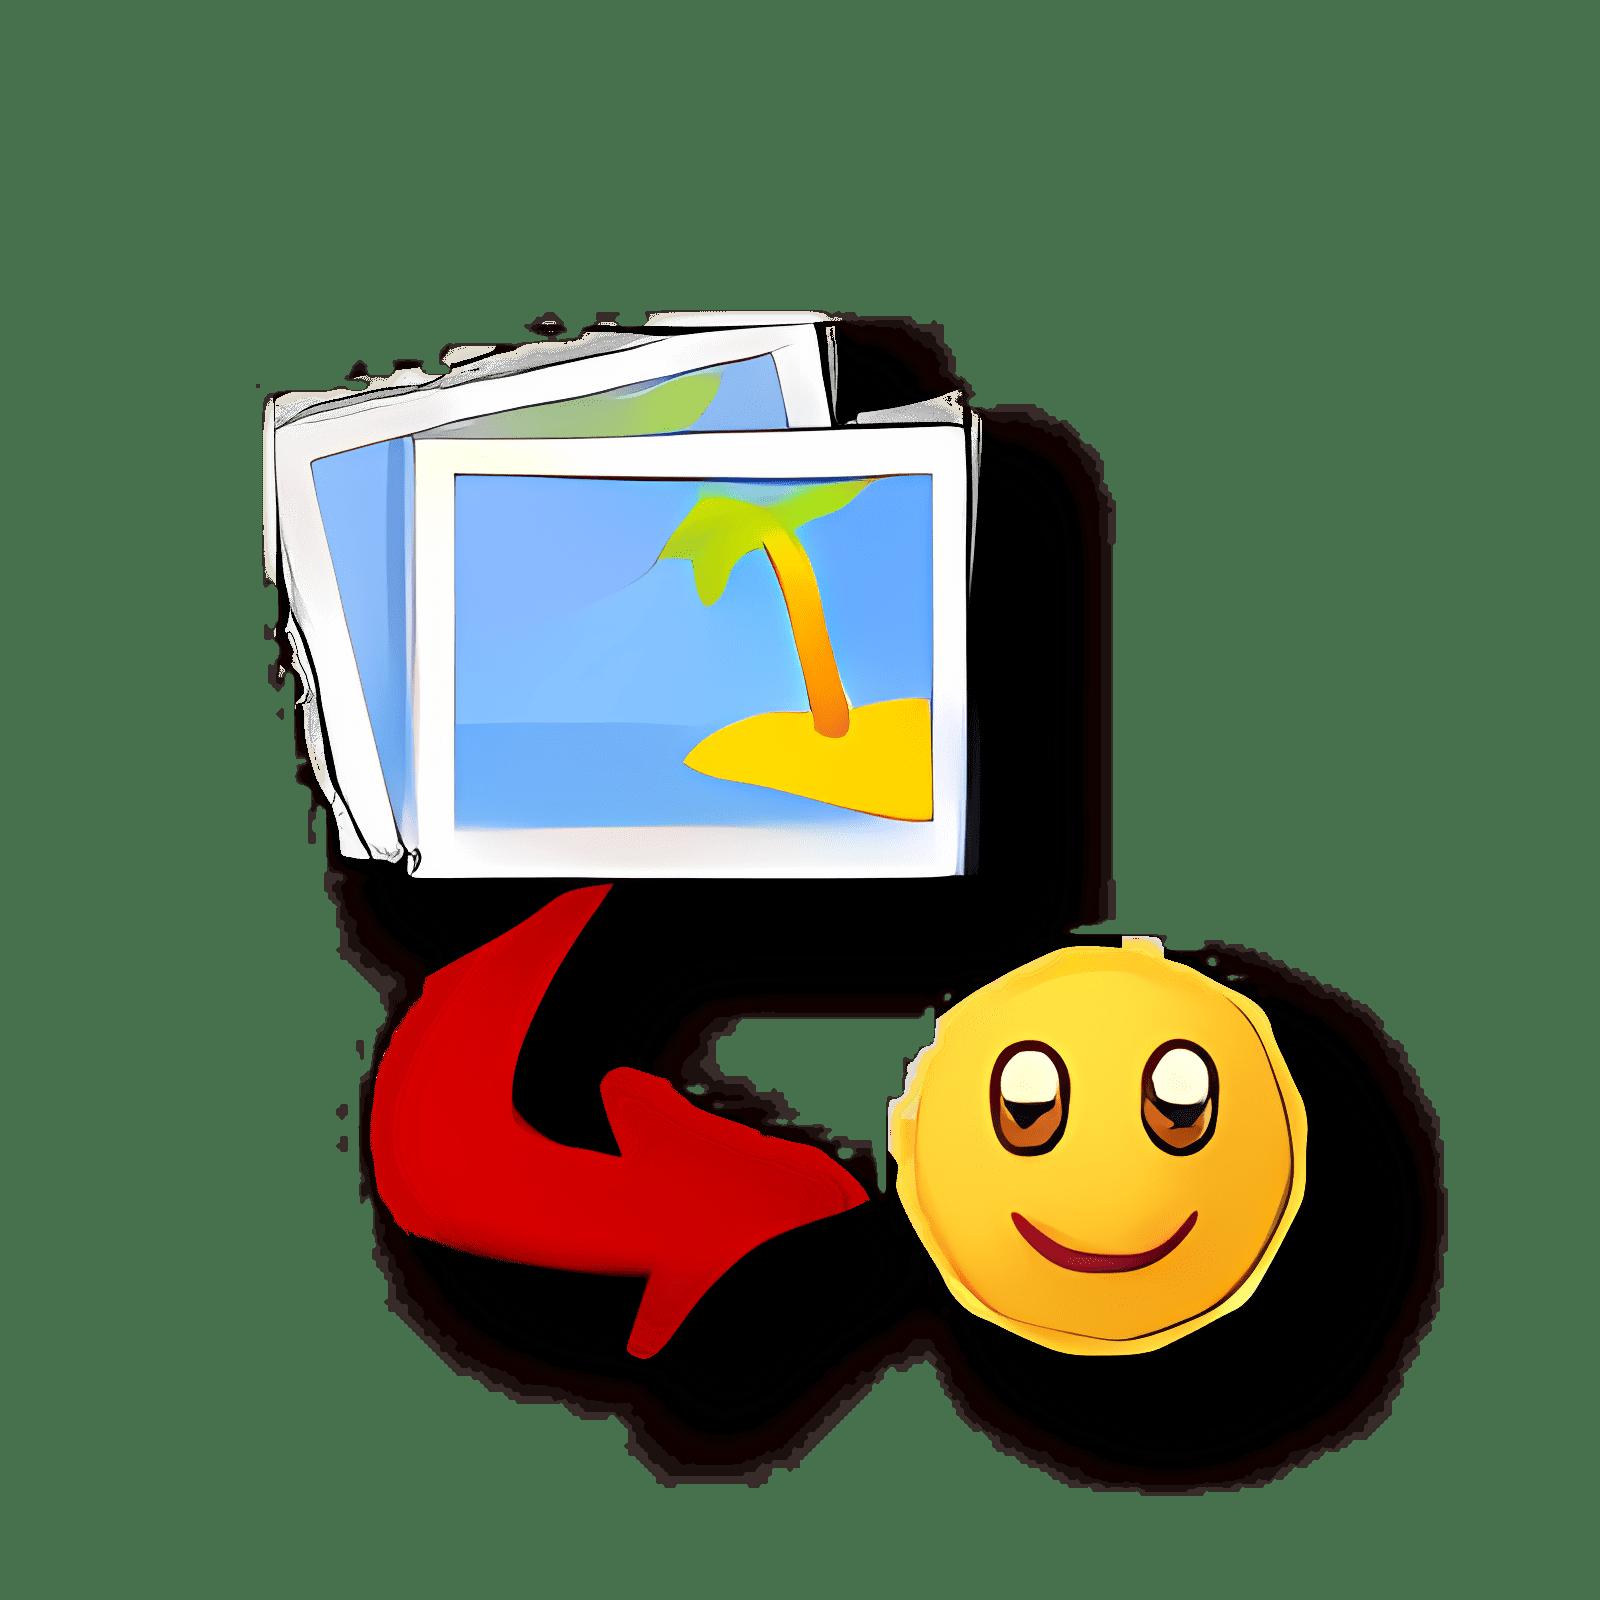 Emoticon Maker